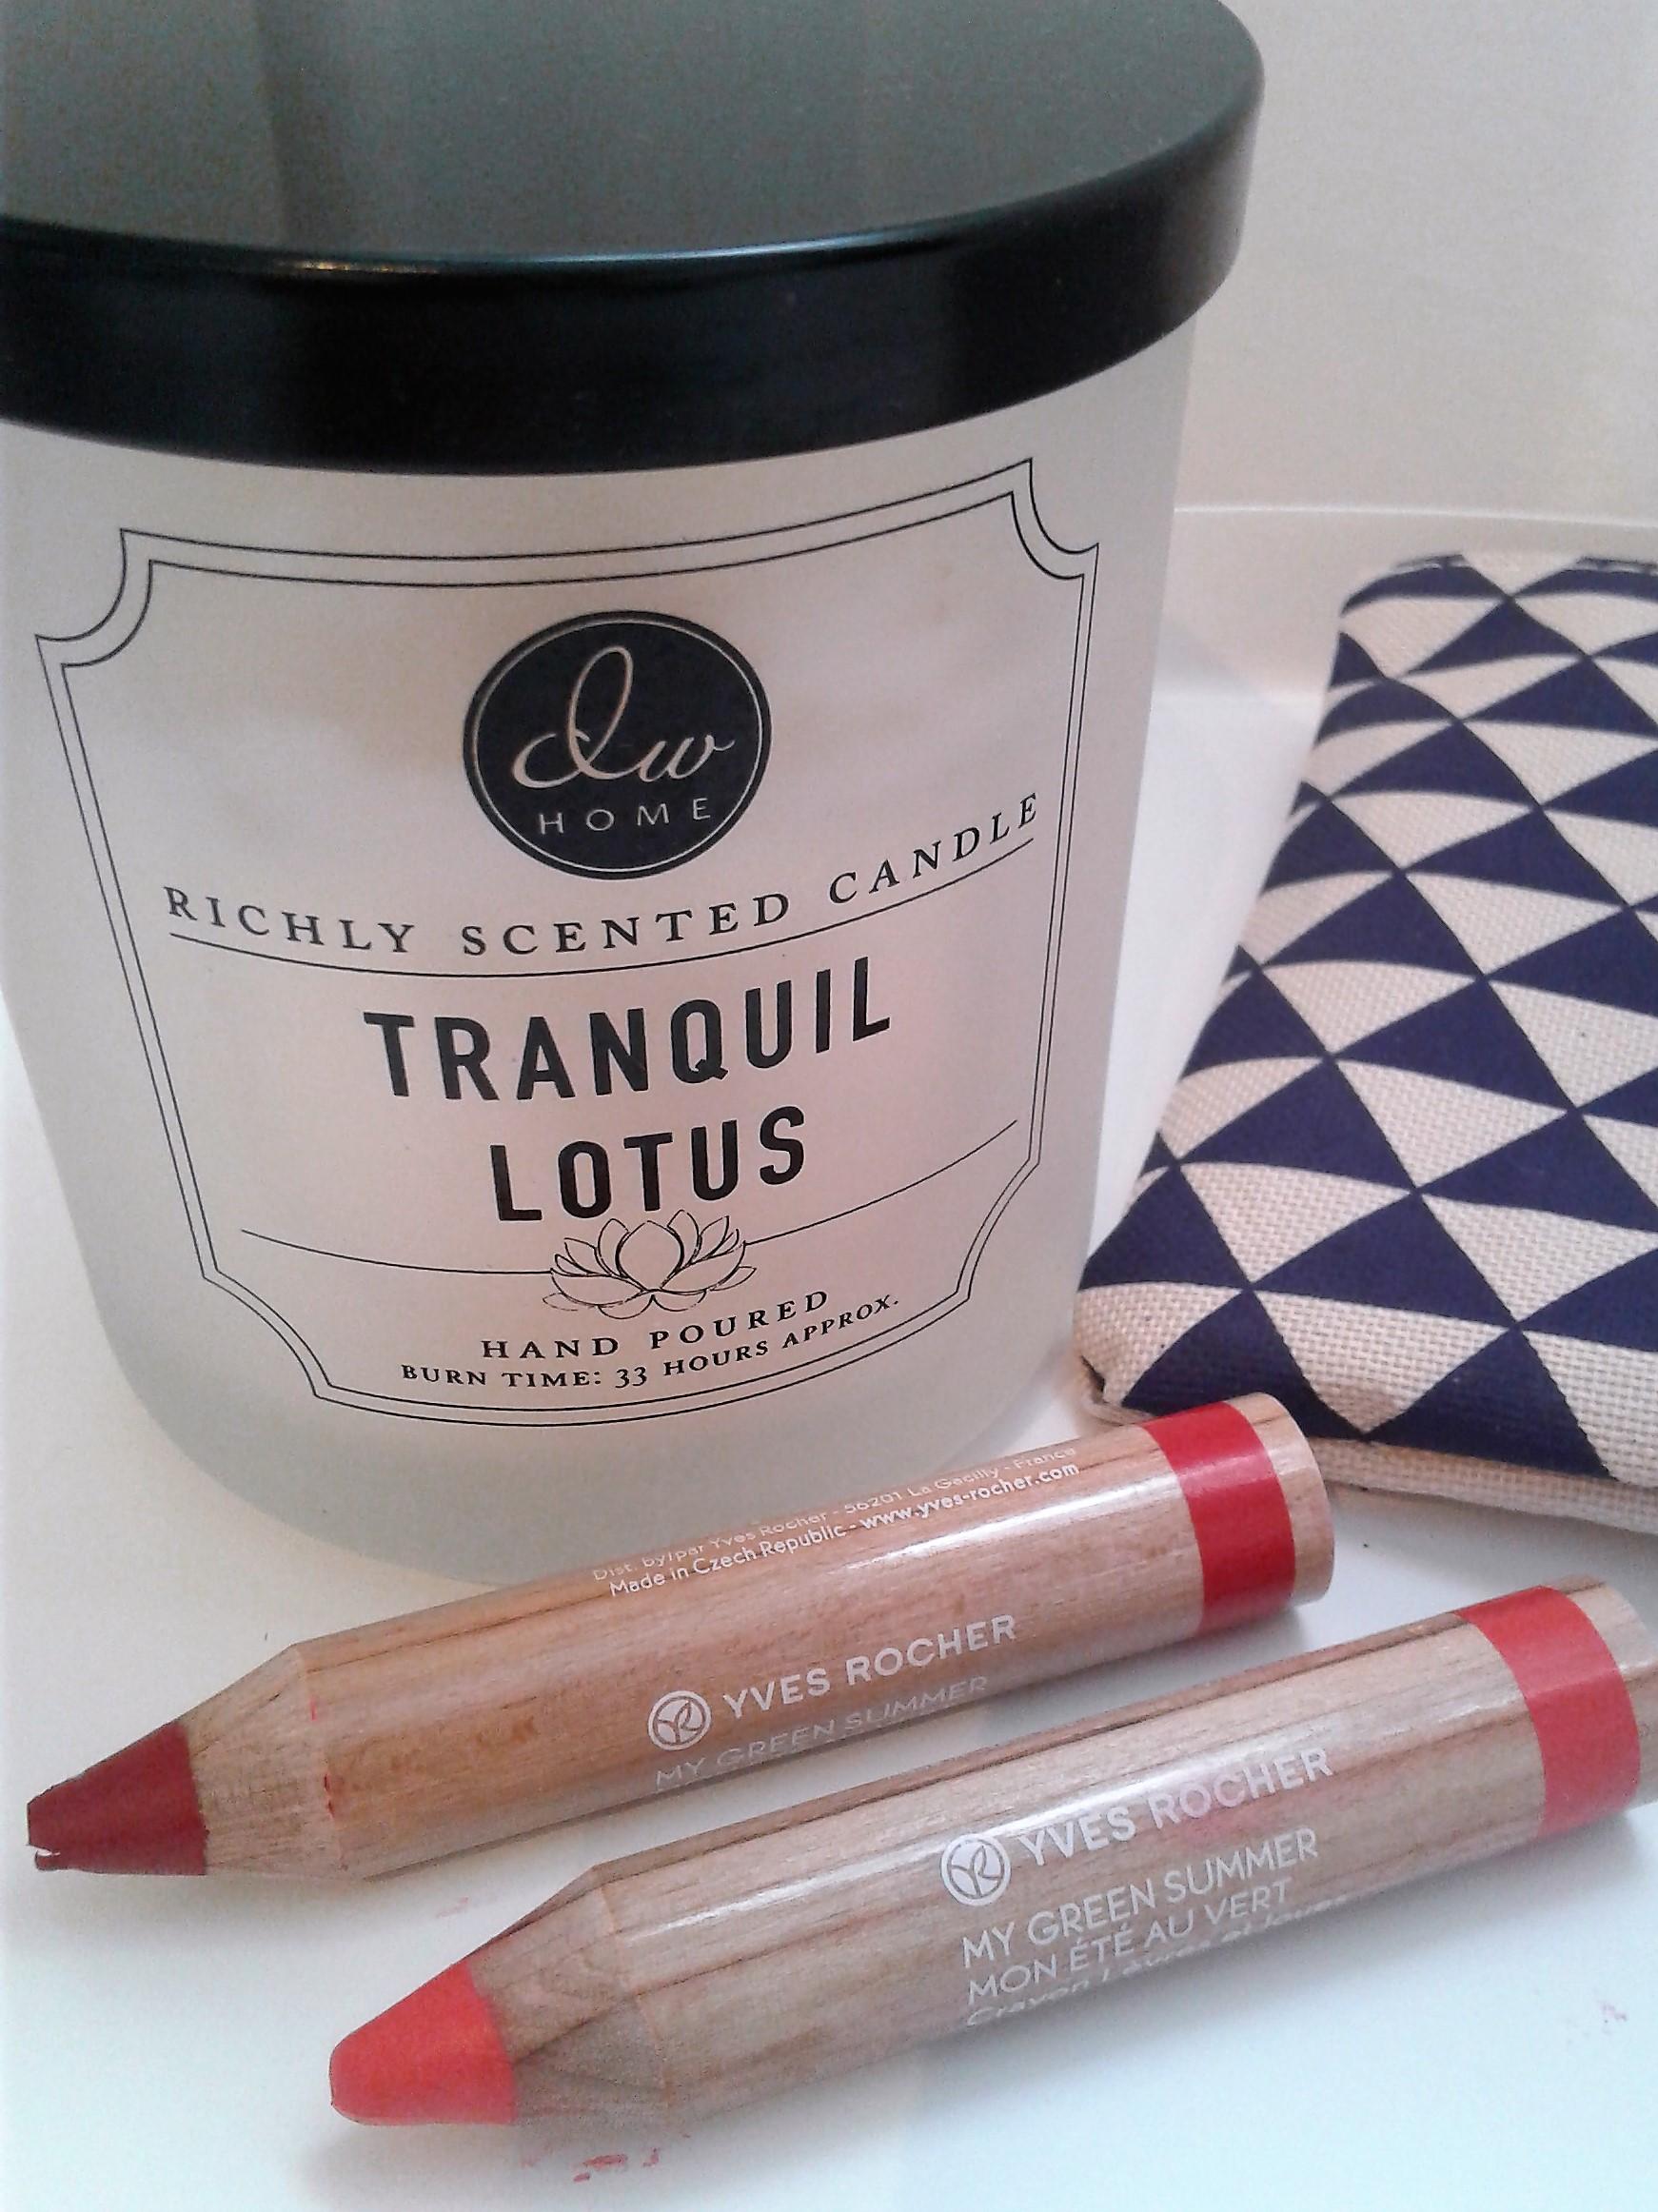 Yves Rocher crayons.jpg